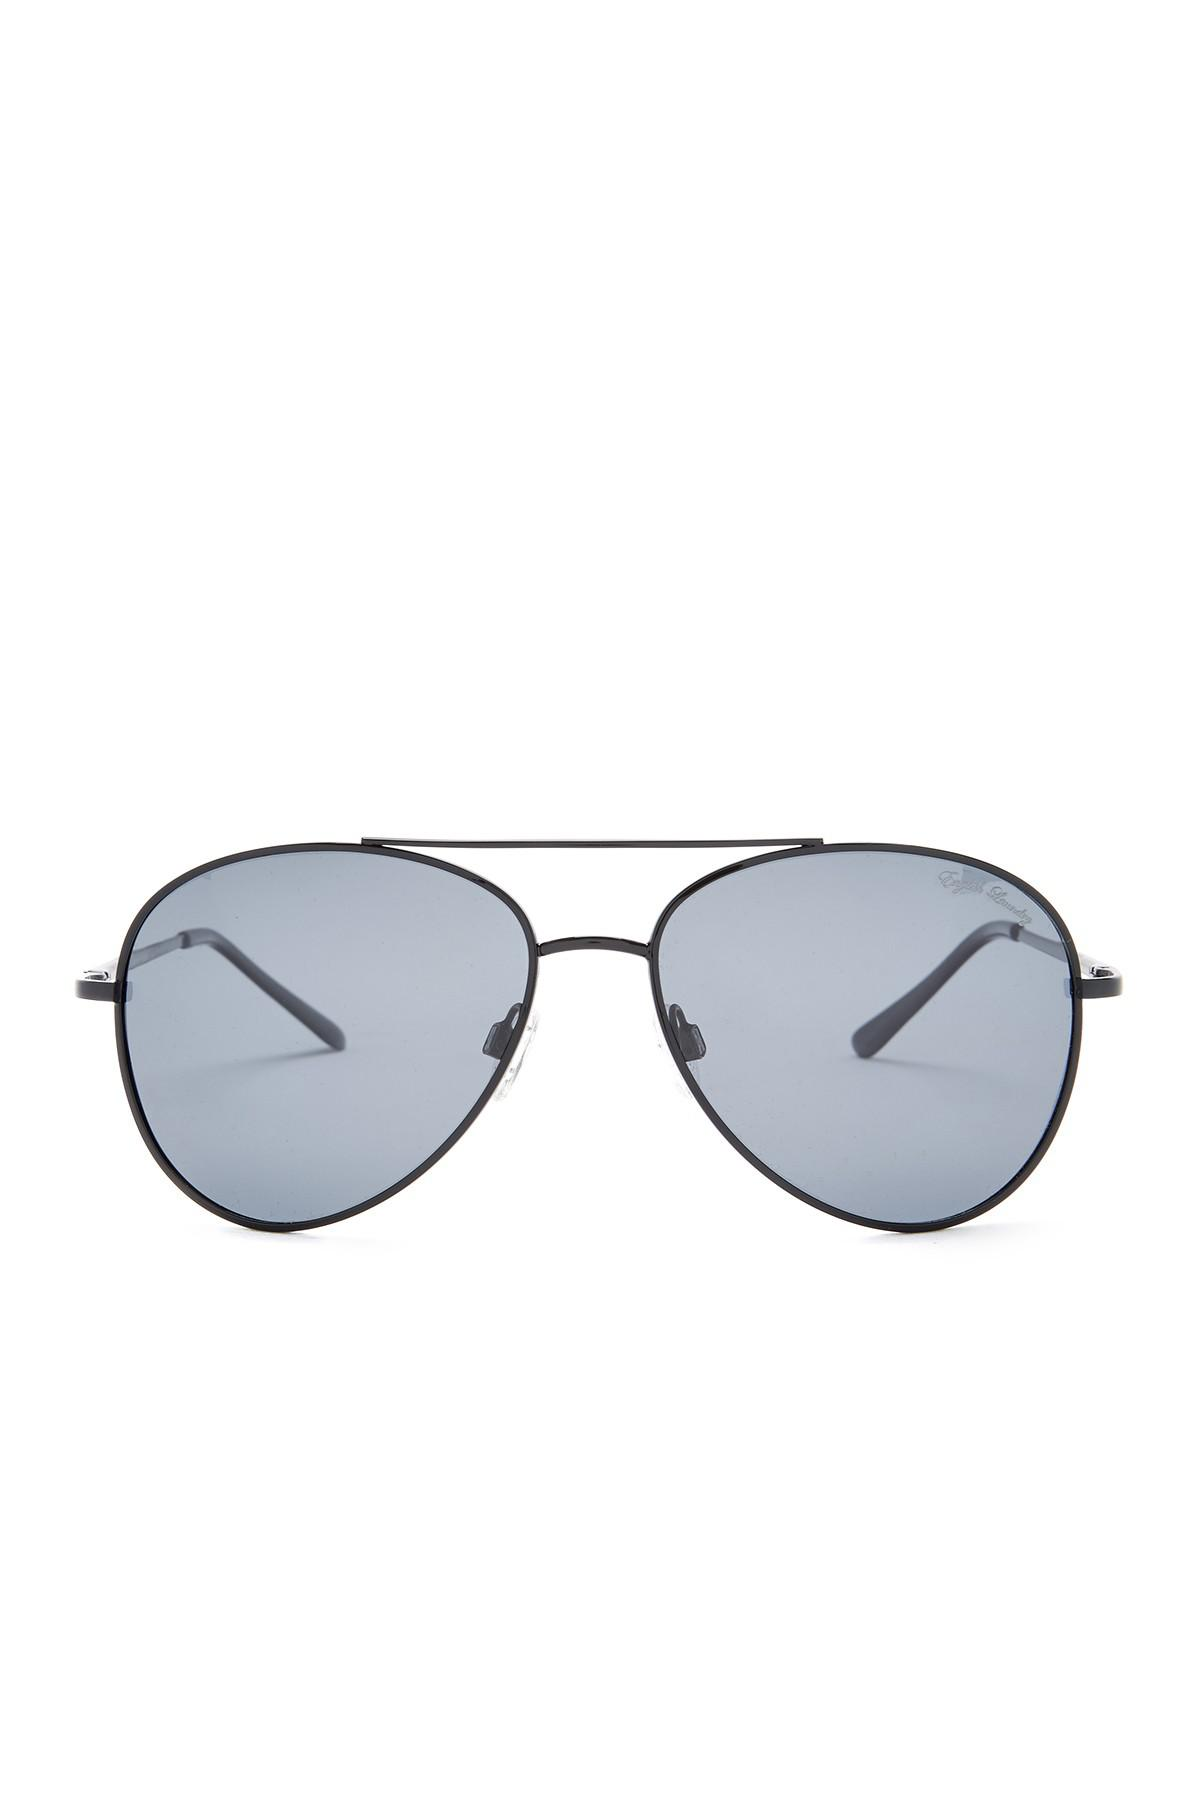 8bc968d55e1a English Laundry Men's Aviator Polarized Sunglasses for Men - Lyst